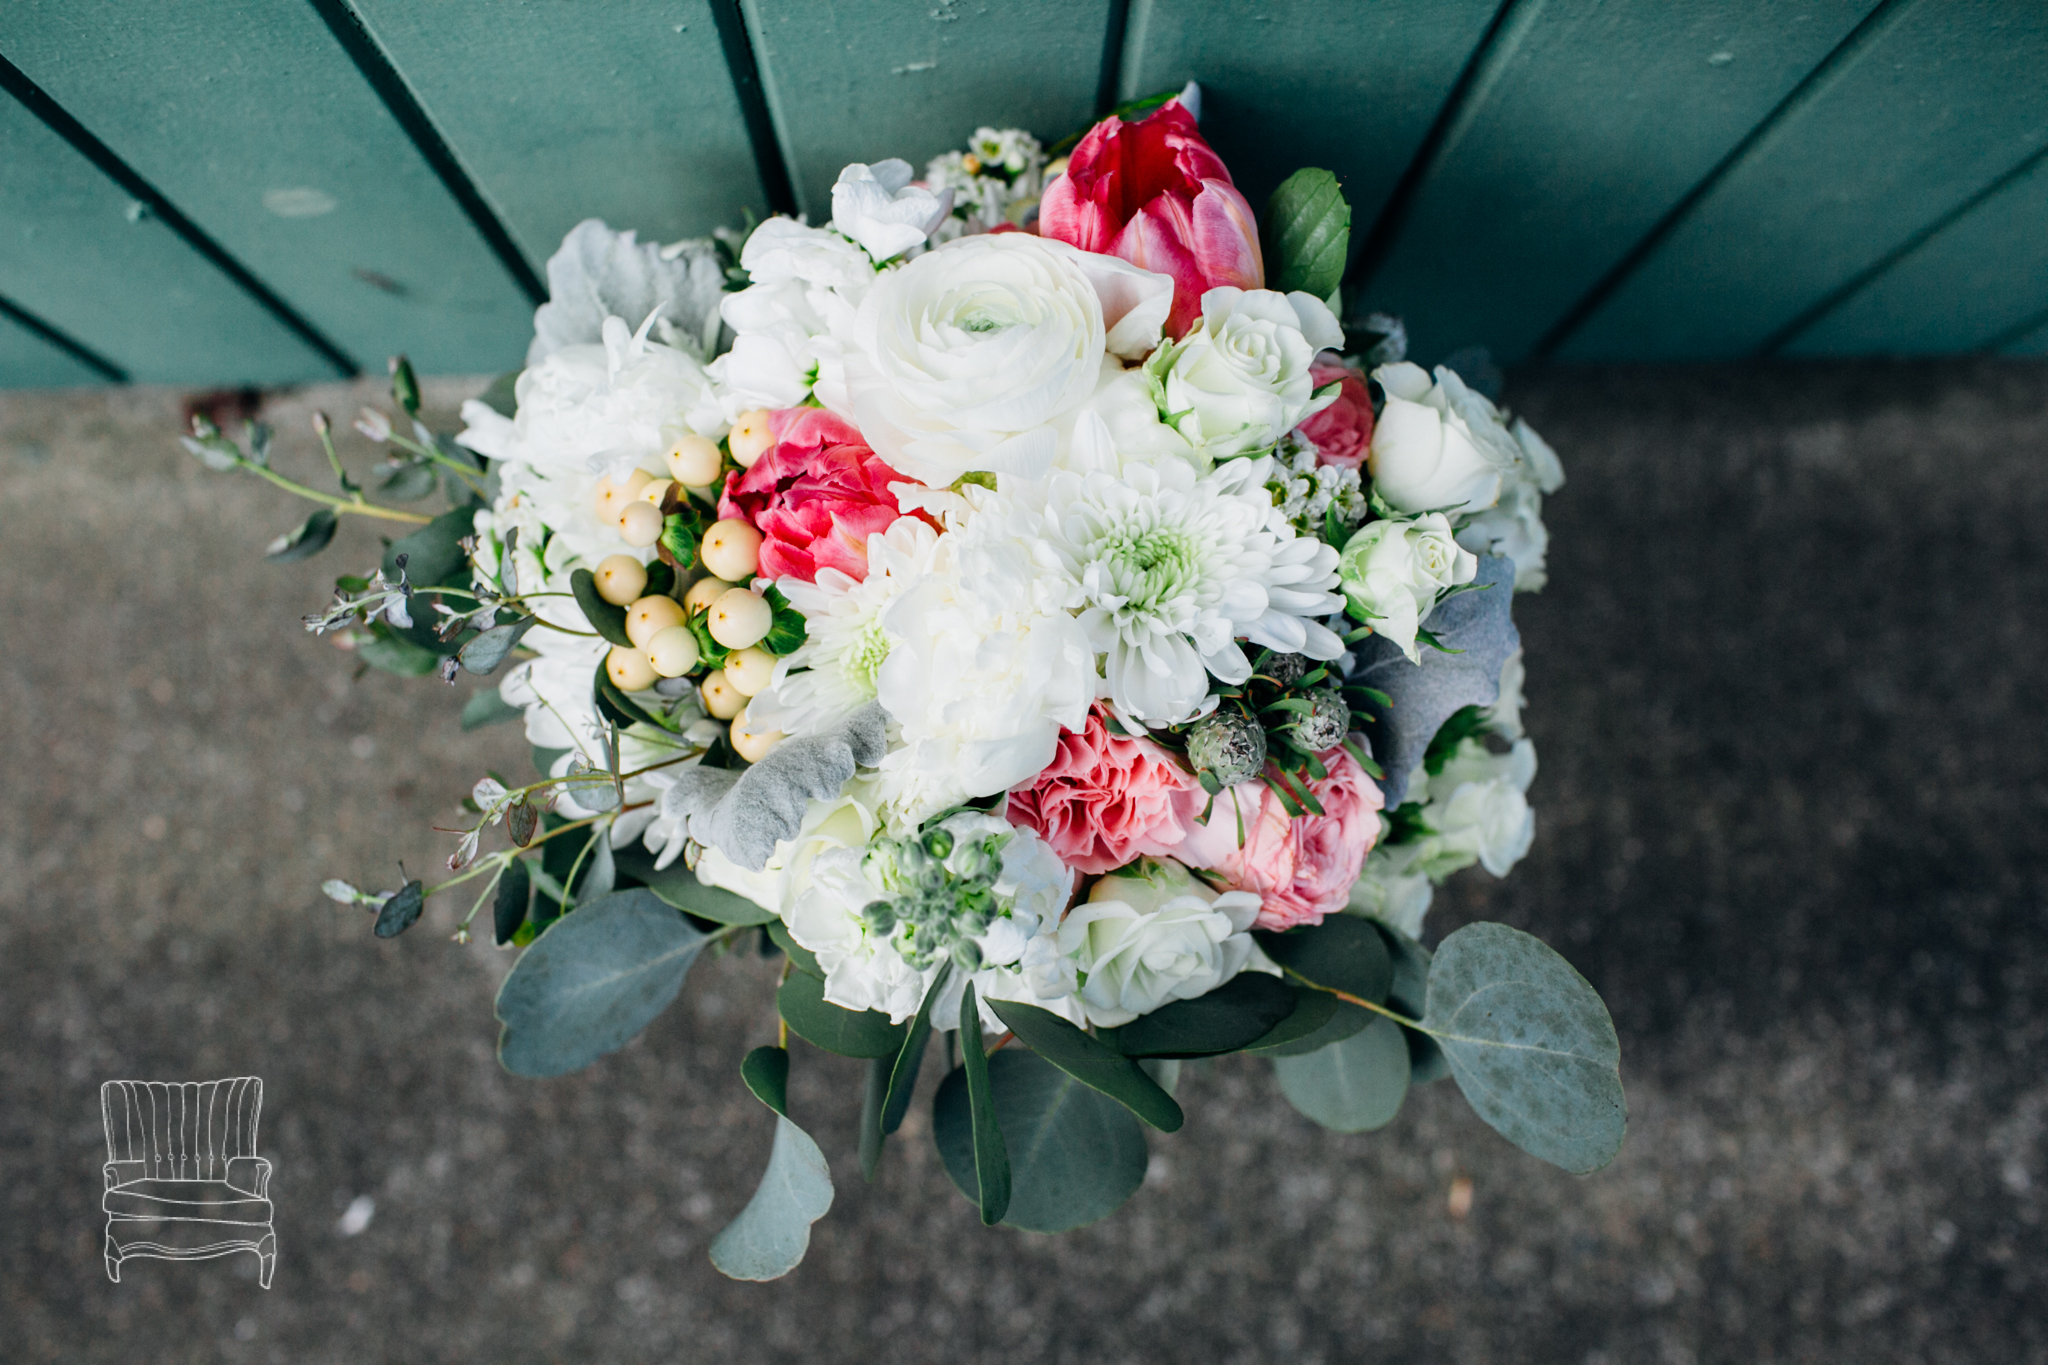 seattle-wedding-photographer-katheryn-moran-russells-bothell-wilkins-wedding-photo-4.jpg